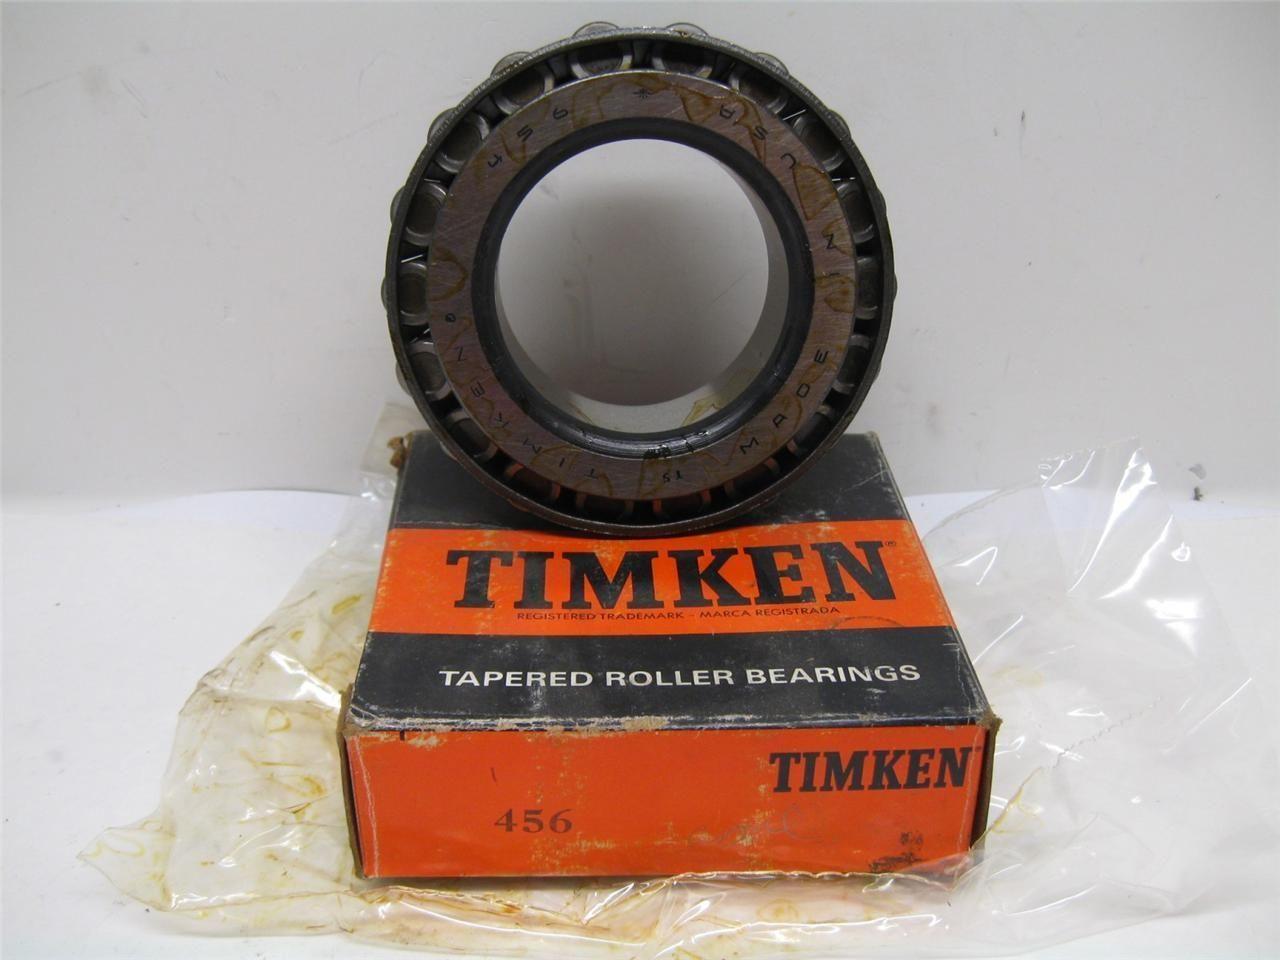 Timken 400 Series 456 Tapered Roller Bearing New